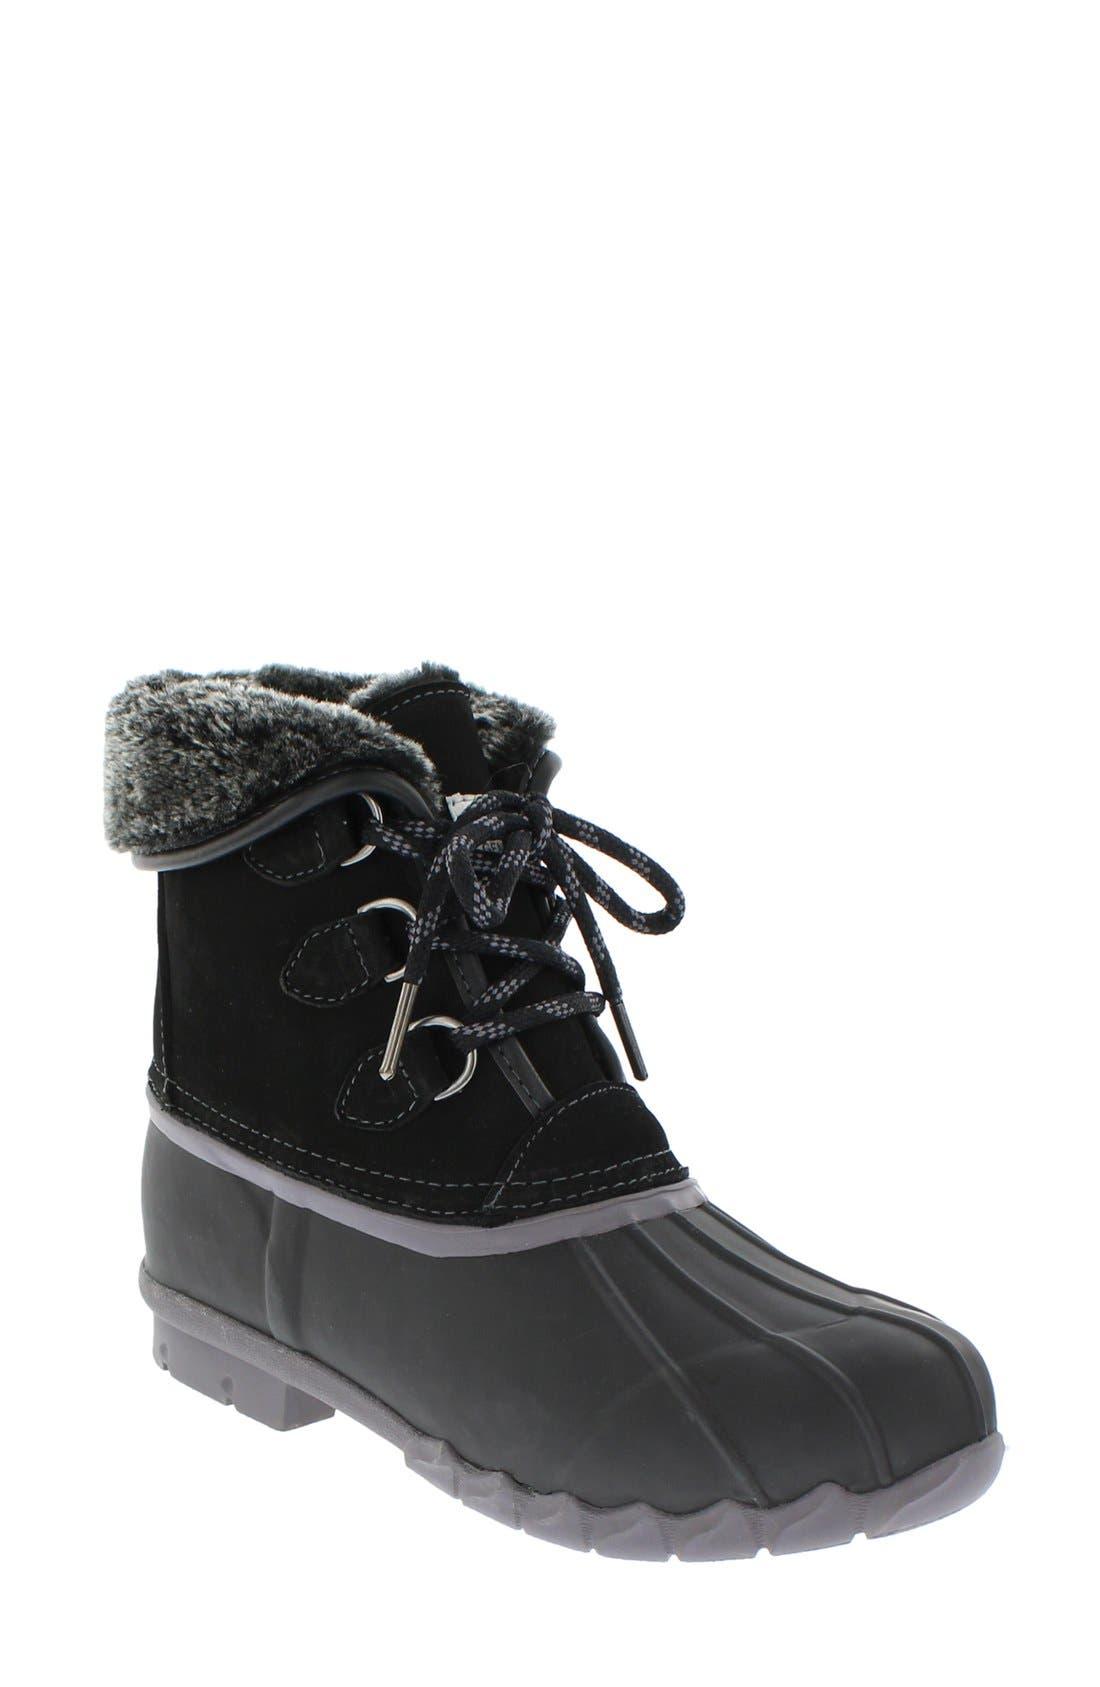 SPORTO Defrost Faux Fur Lined Duck Boot